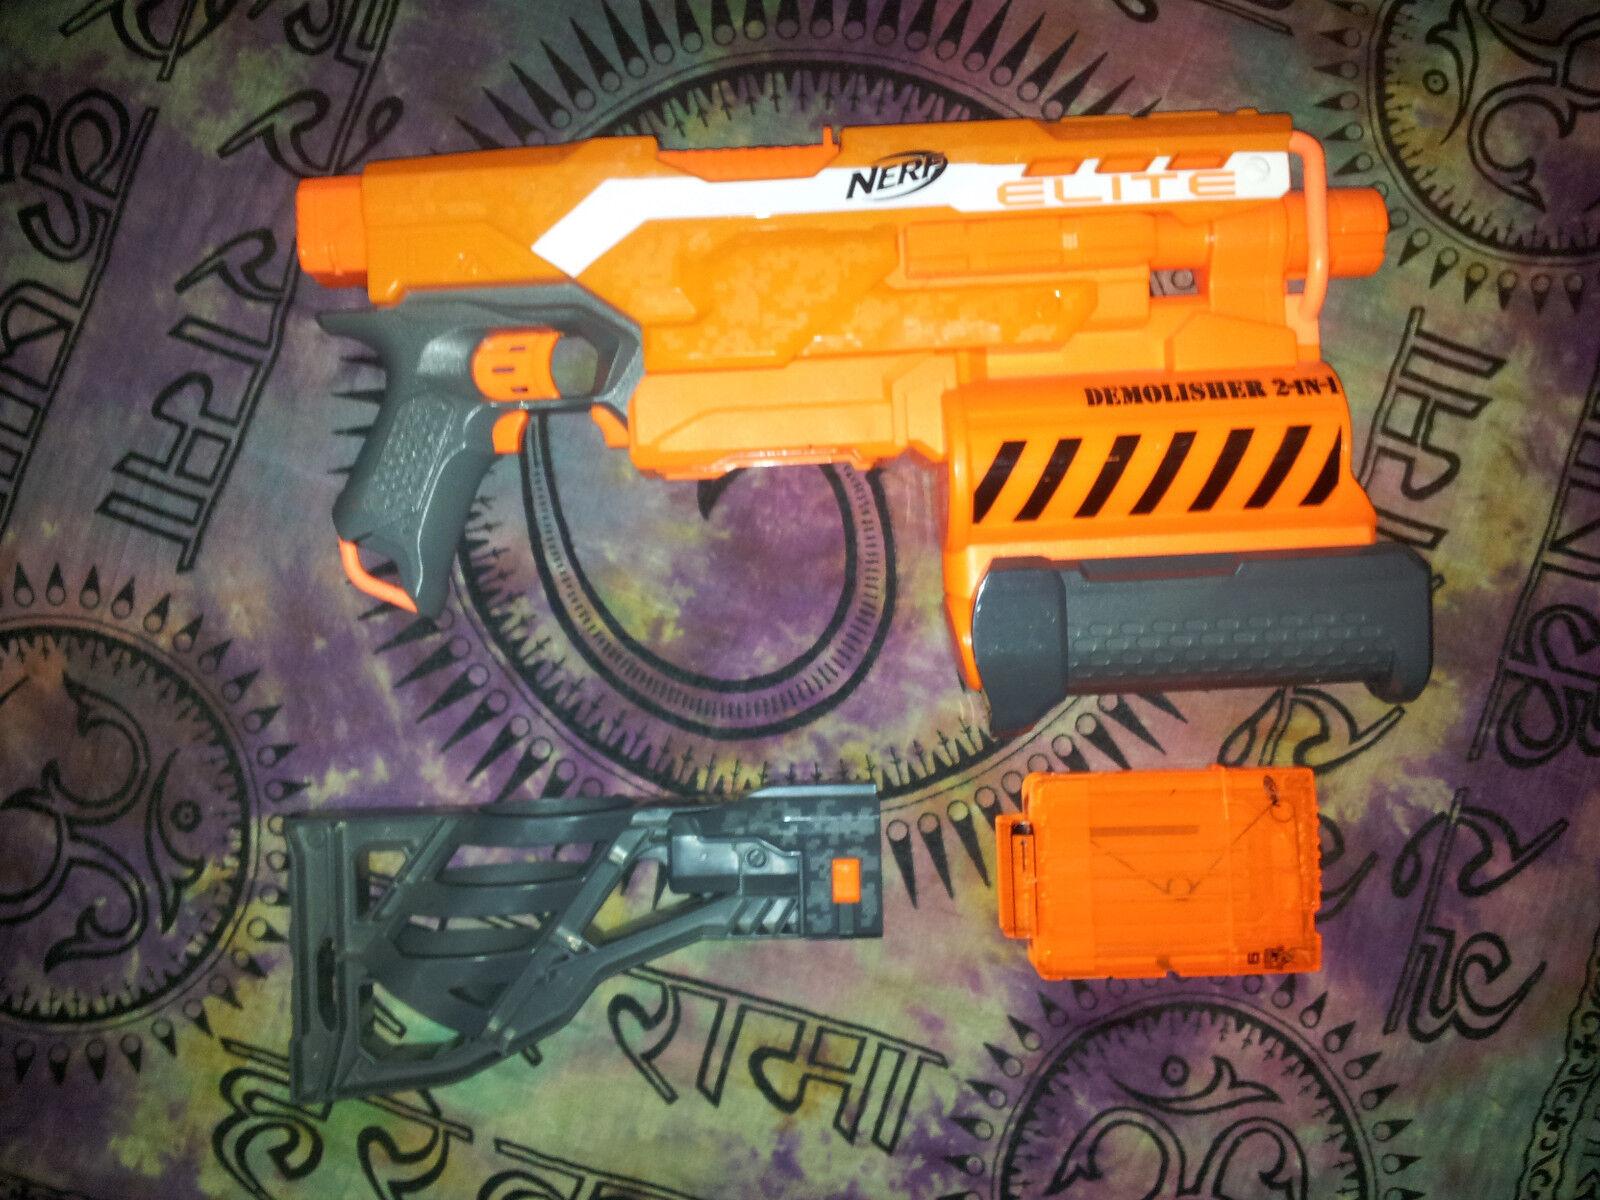 Hasbro Nerf N-strike Elite XD Retaliator Spielzeug-Bogen, -Armbrust & -Dart Armbrust 74608400 günstig kaufen